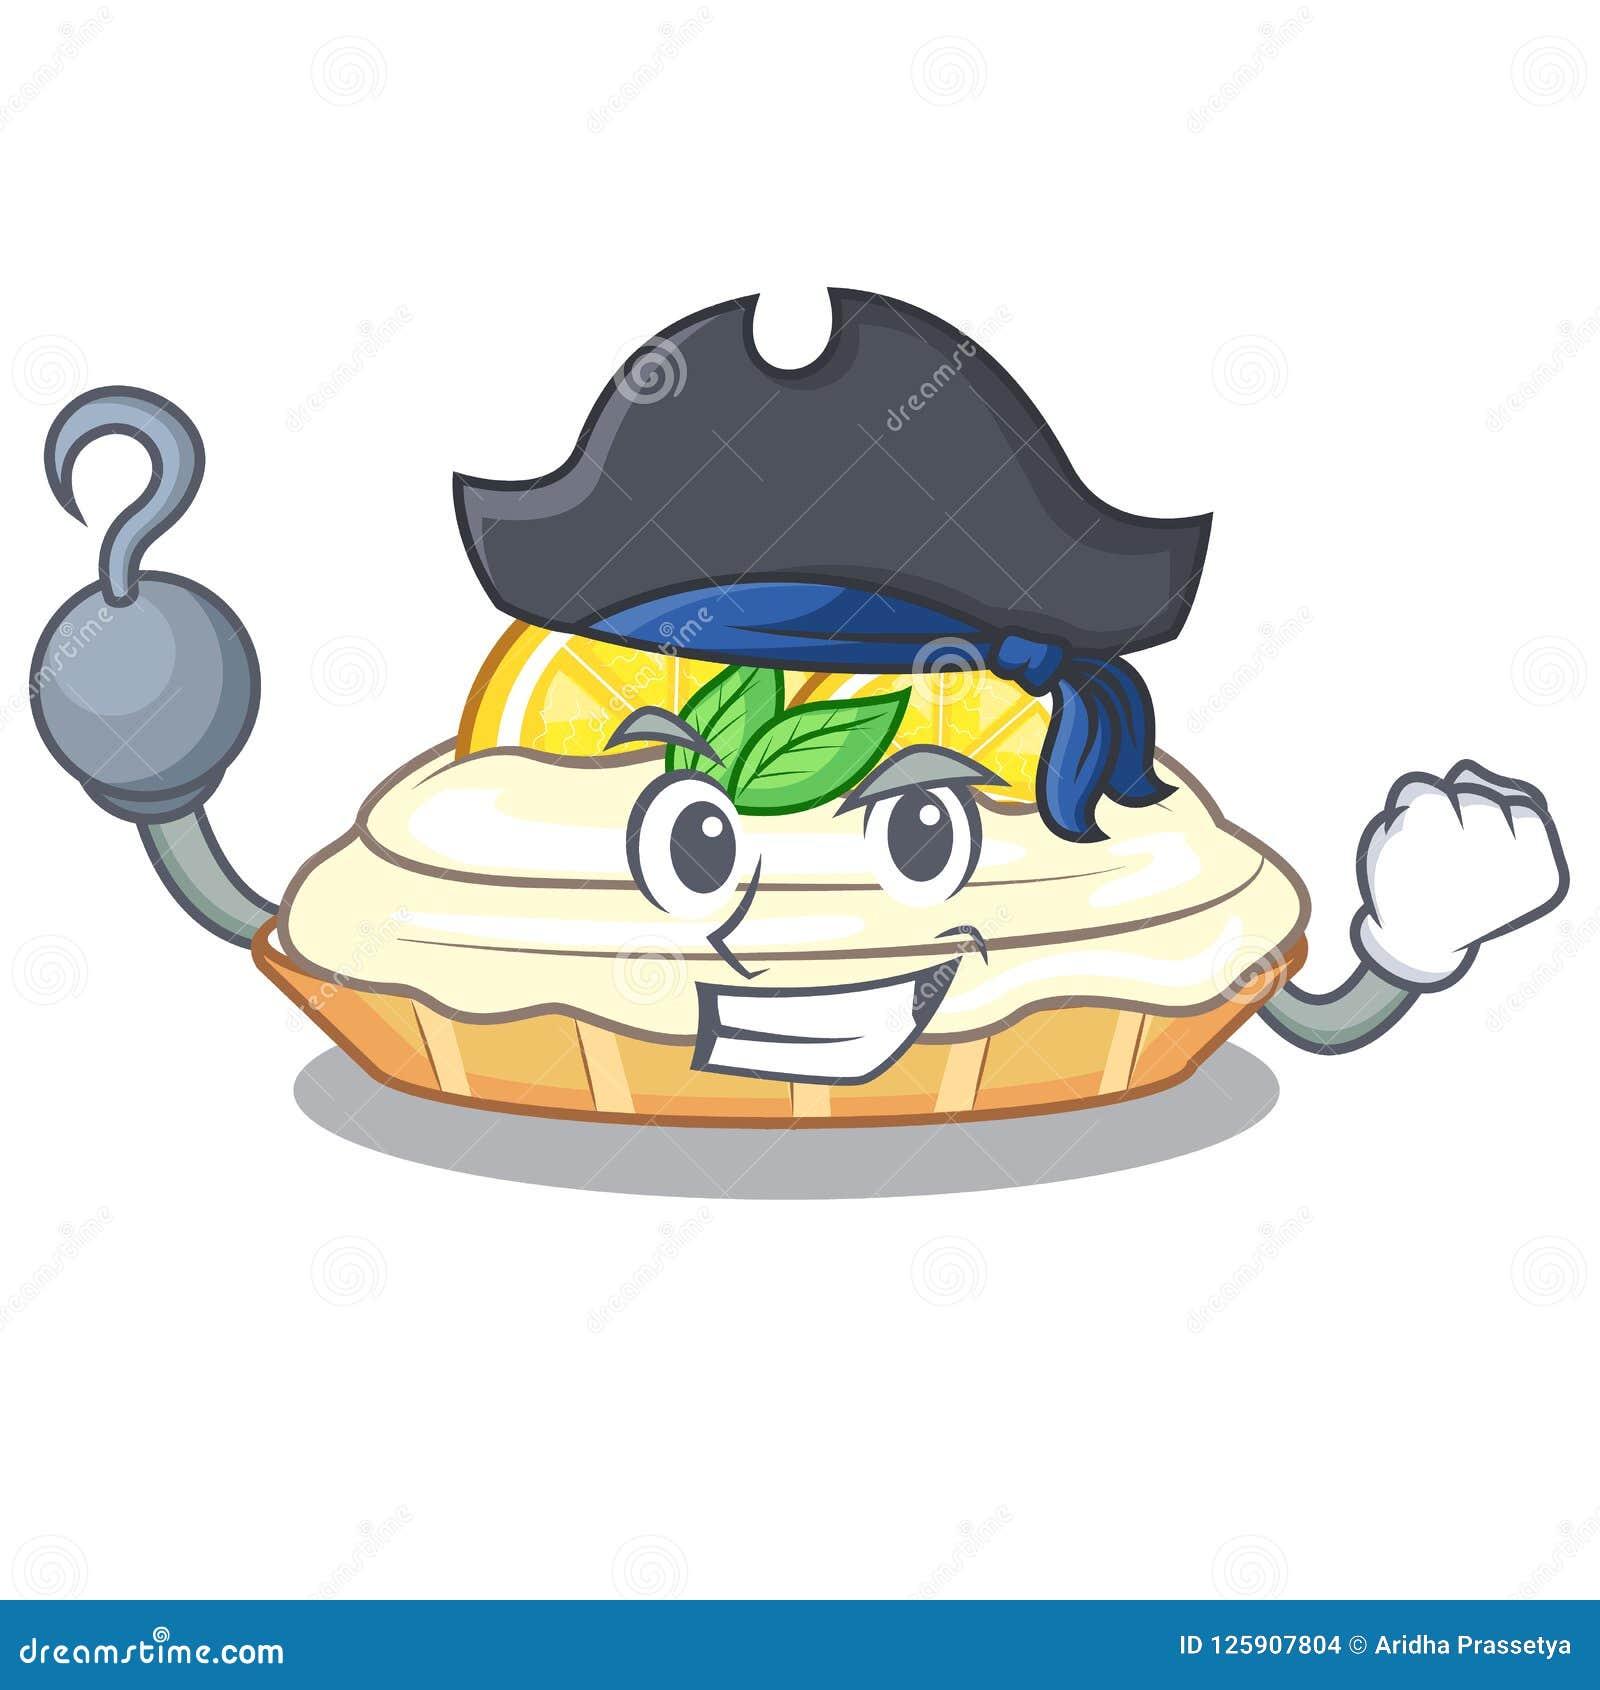 Pirate Cartoon Lemon Cake With Sugar Powder Stock Vector